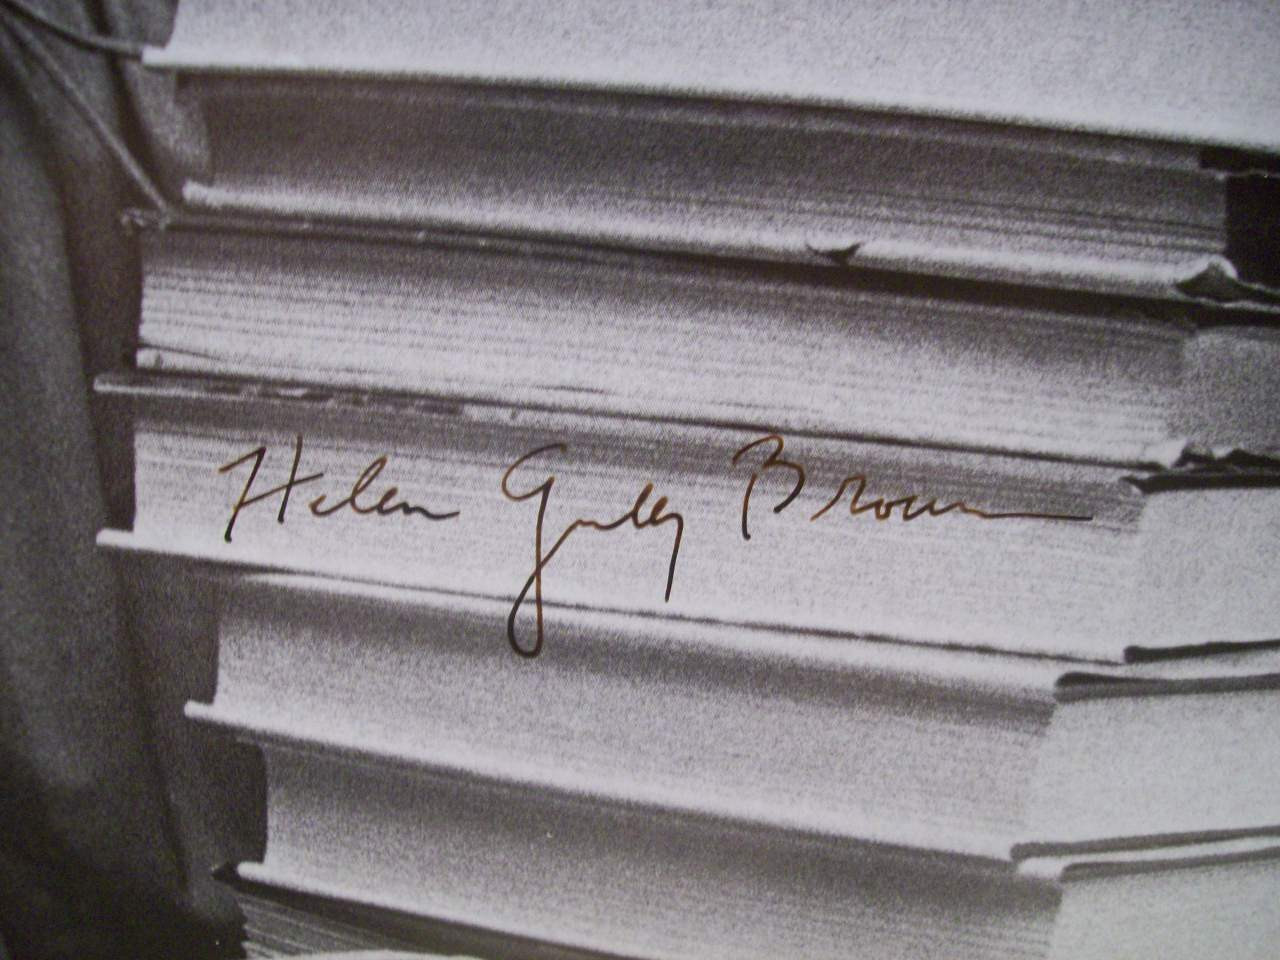 Brown, Helen Gurley Photo Signed Autograph Cosmopolitan